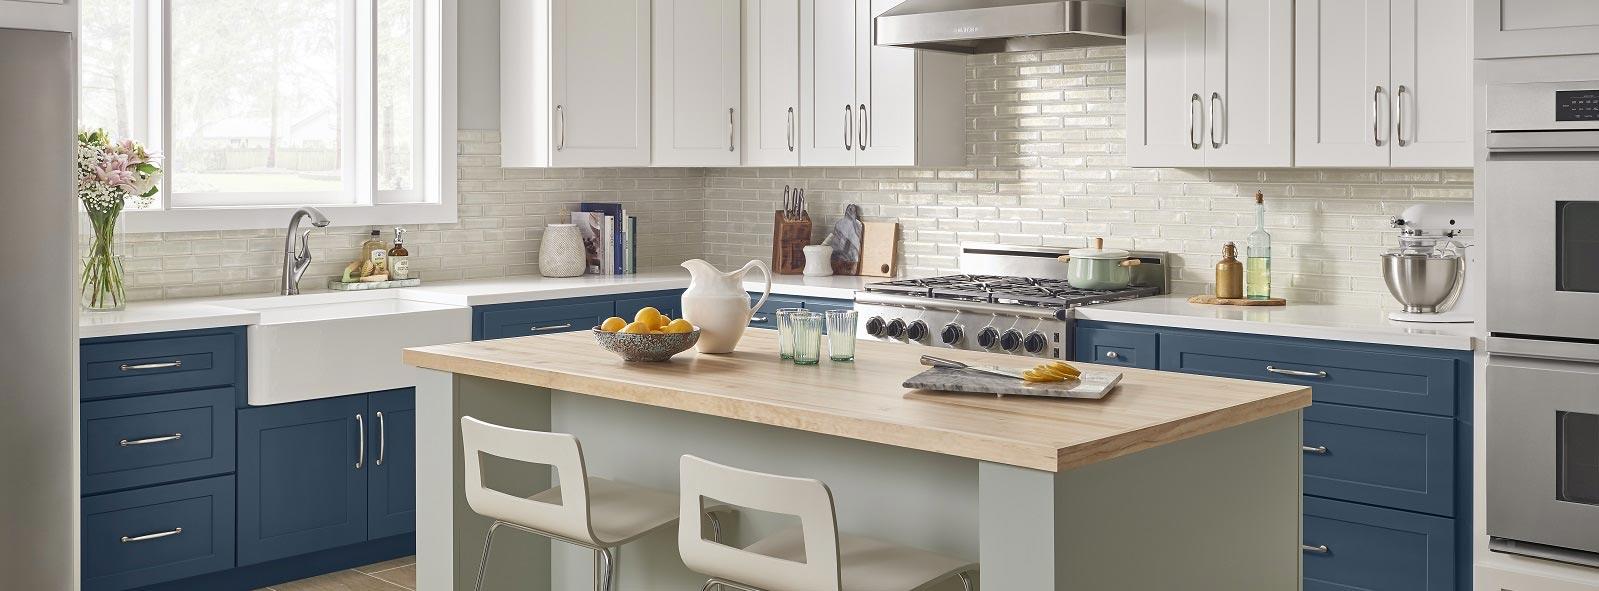 two-tone kitchen cabinets Charlotte